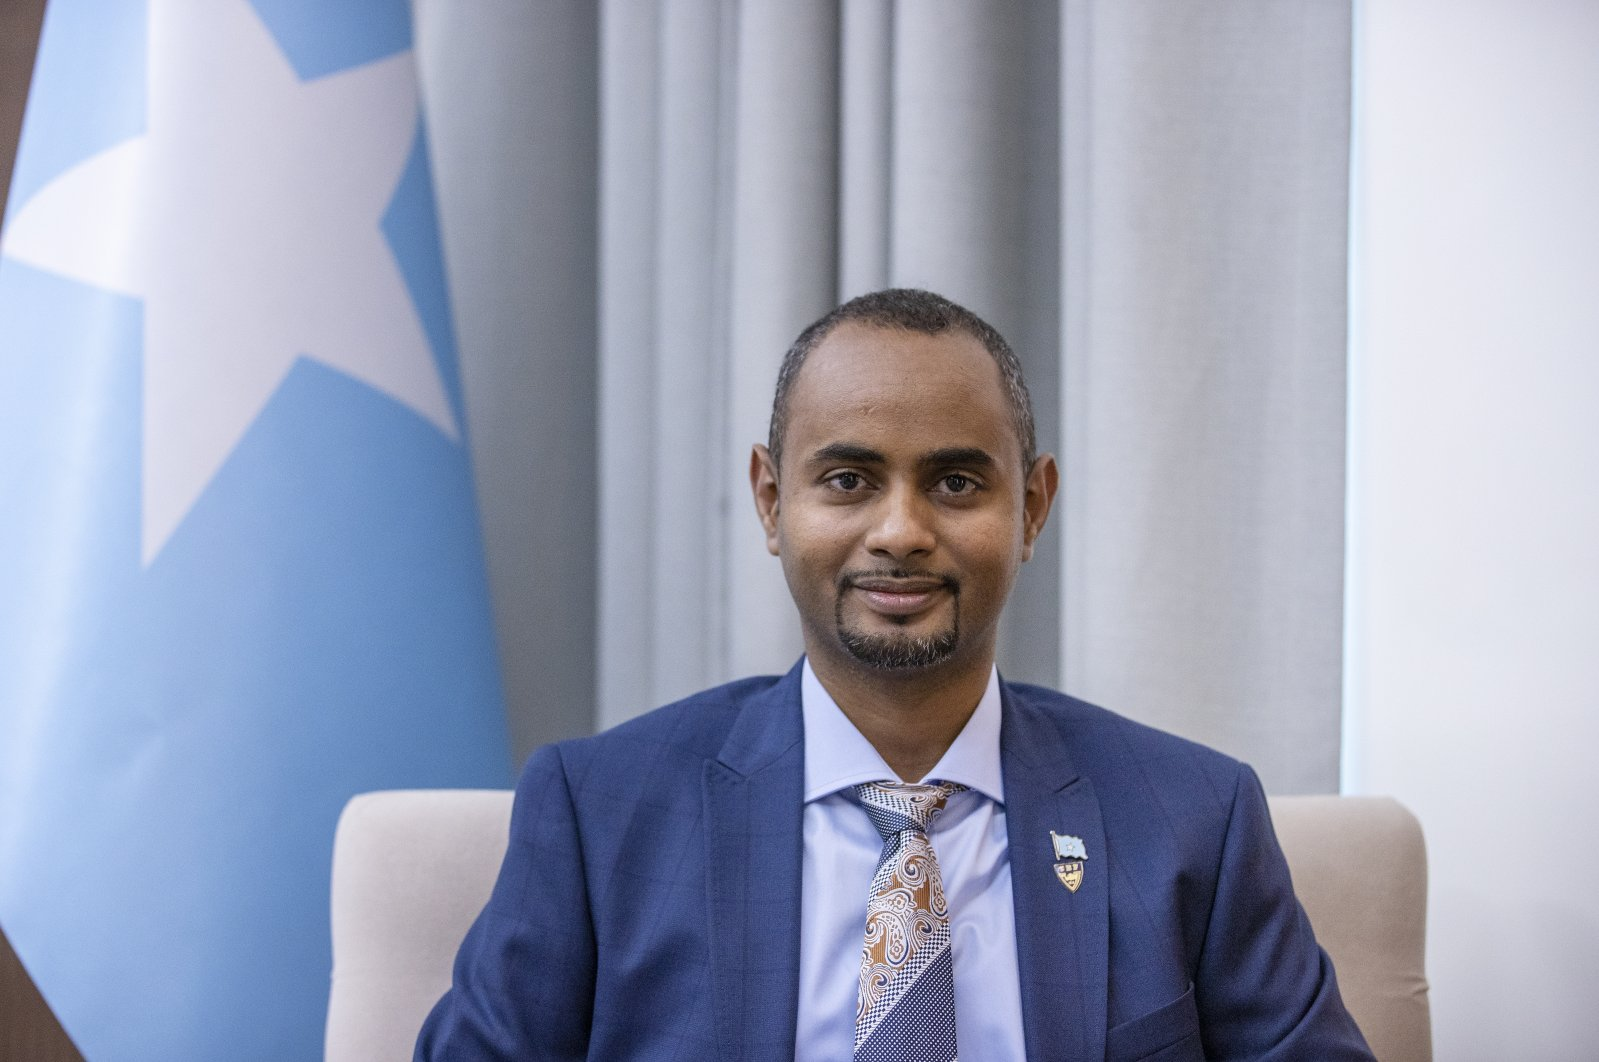 Somali Justice Minister Abdulkadir Mohamed Nur speaks to Anadolu Agency (AA) in an interview in Ankara, Turkey, Dec. 27, 2020. (AA Photo)